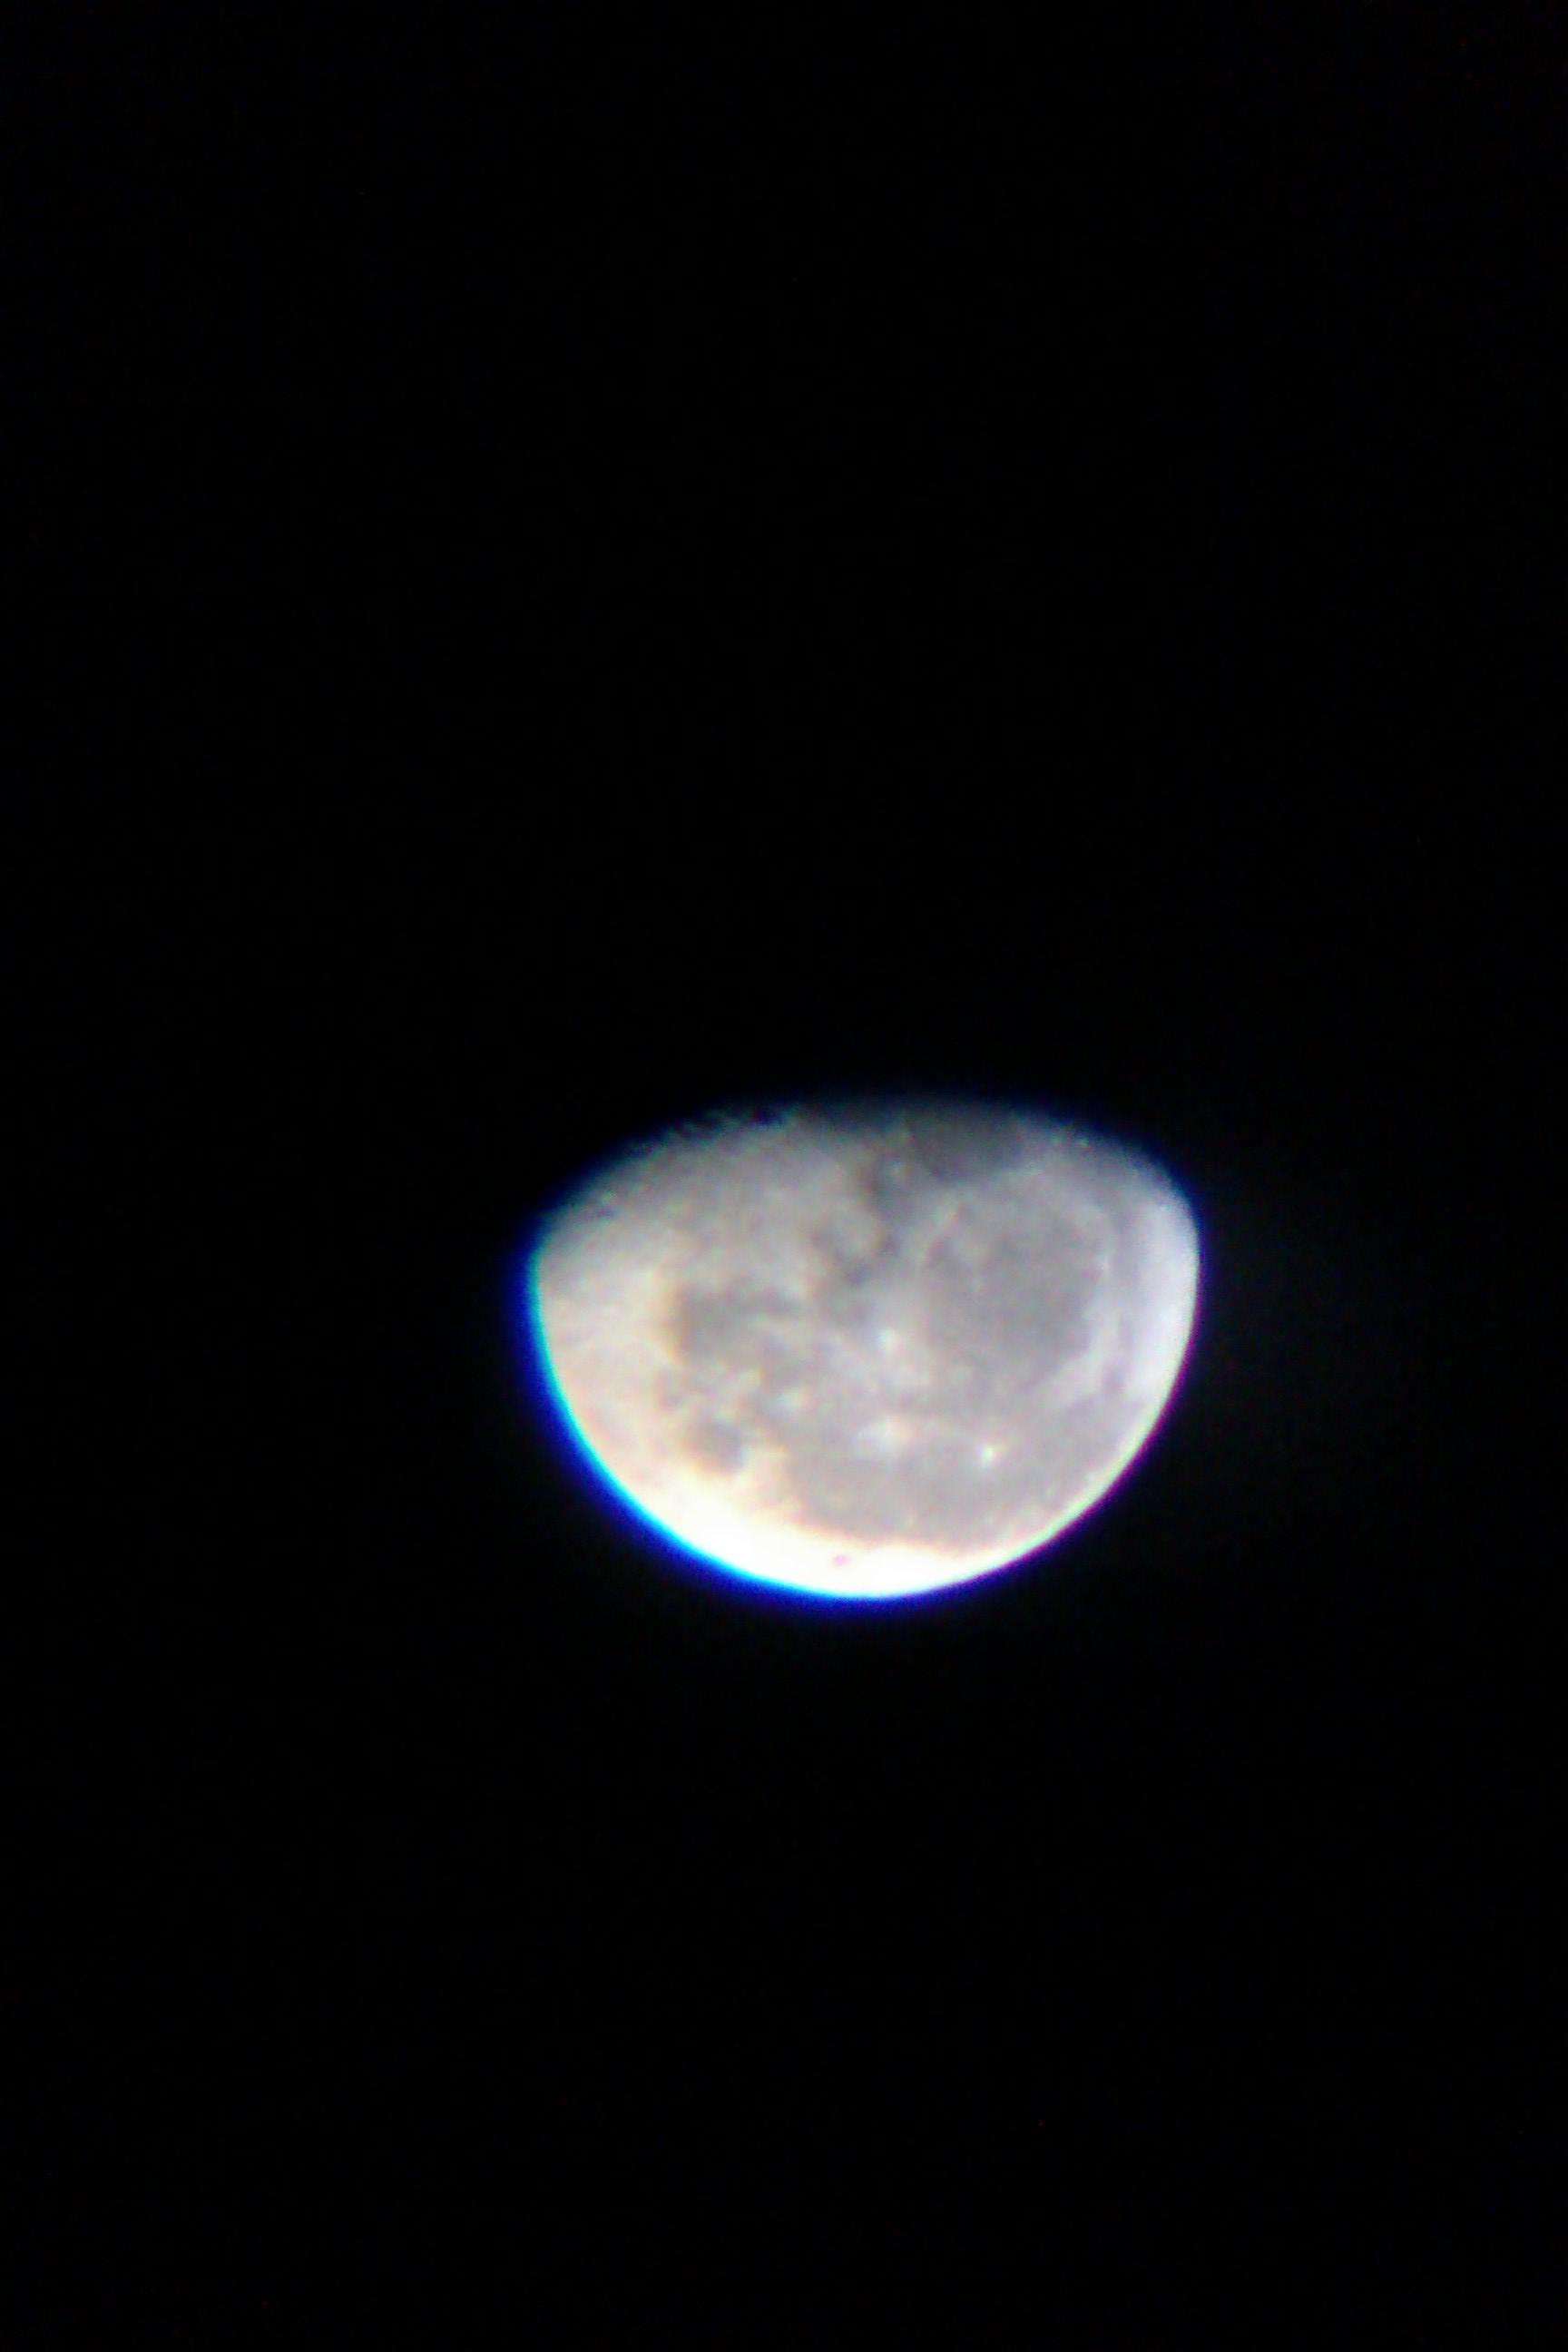 myblog.9e.cz/teleskop/M14.jpg